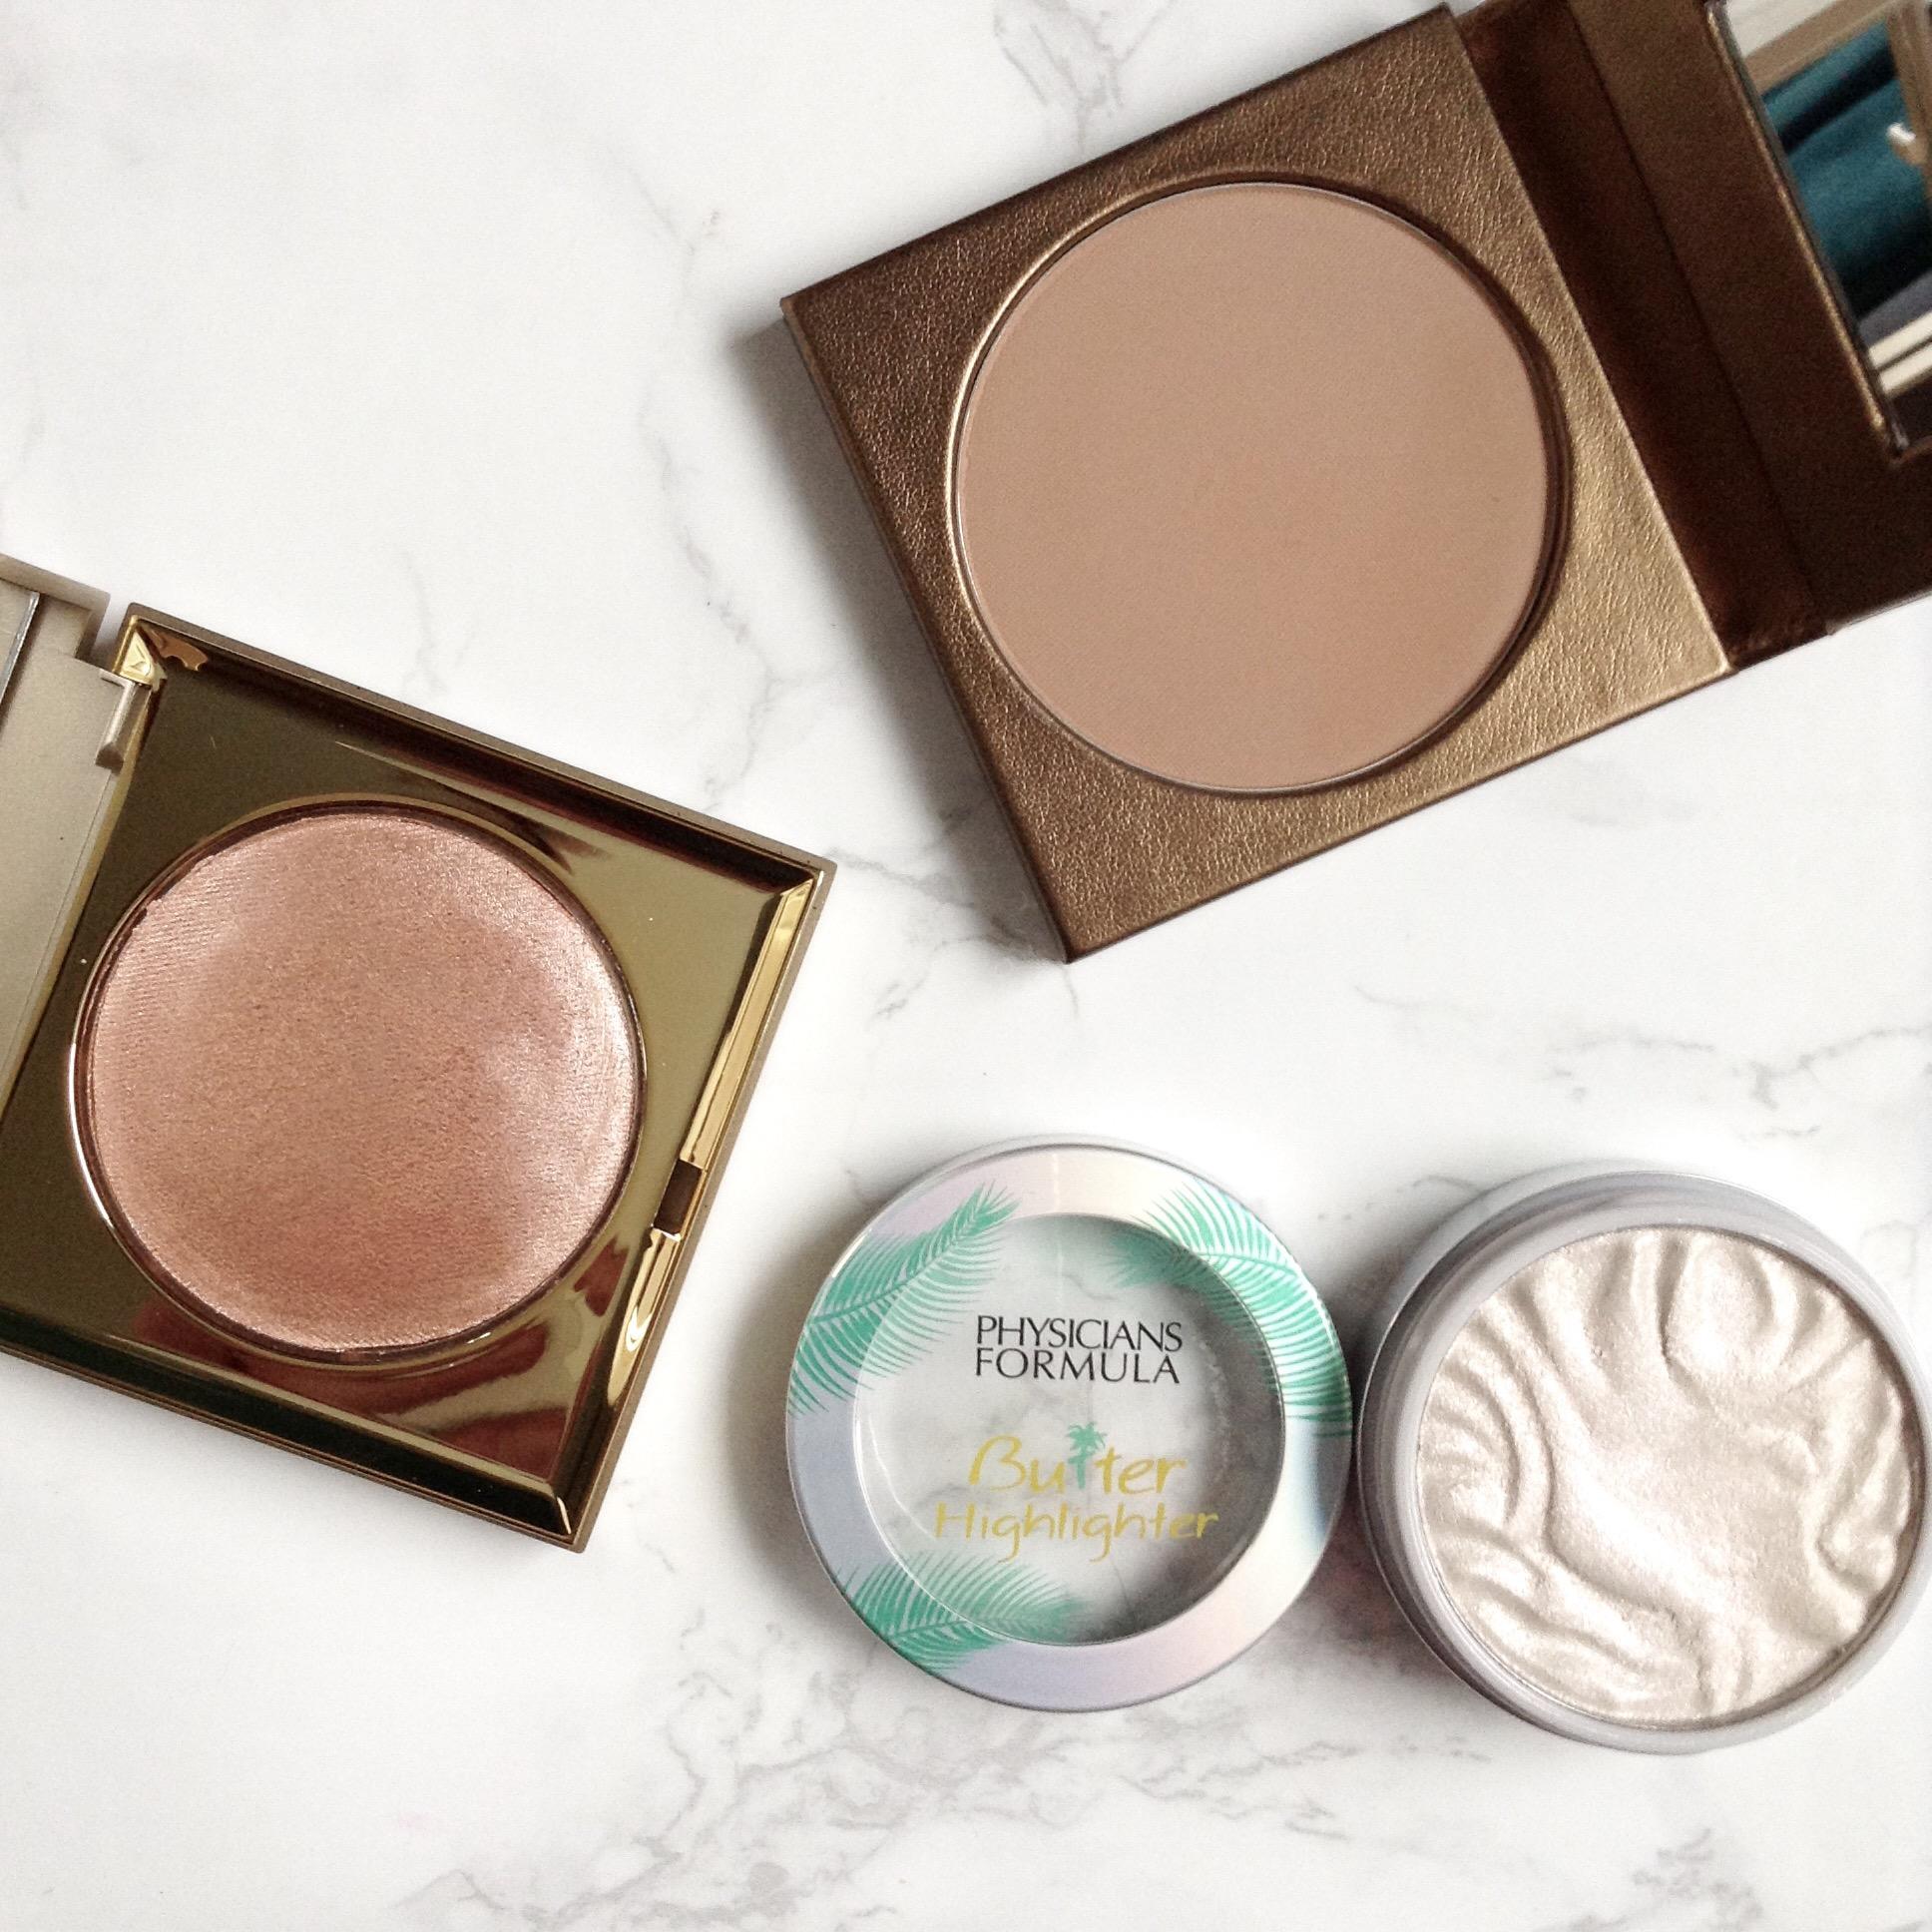 Stila putty highlighter – Beautyholics101